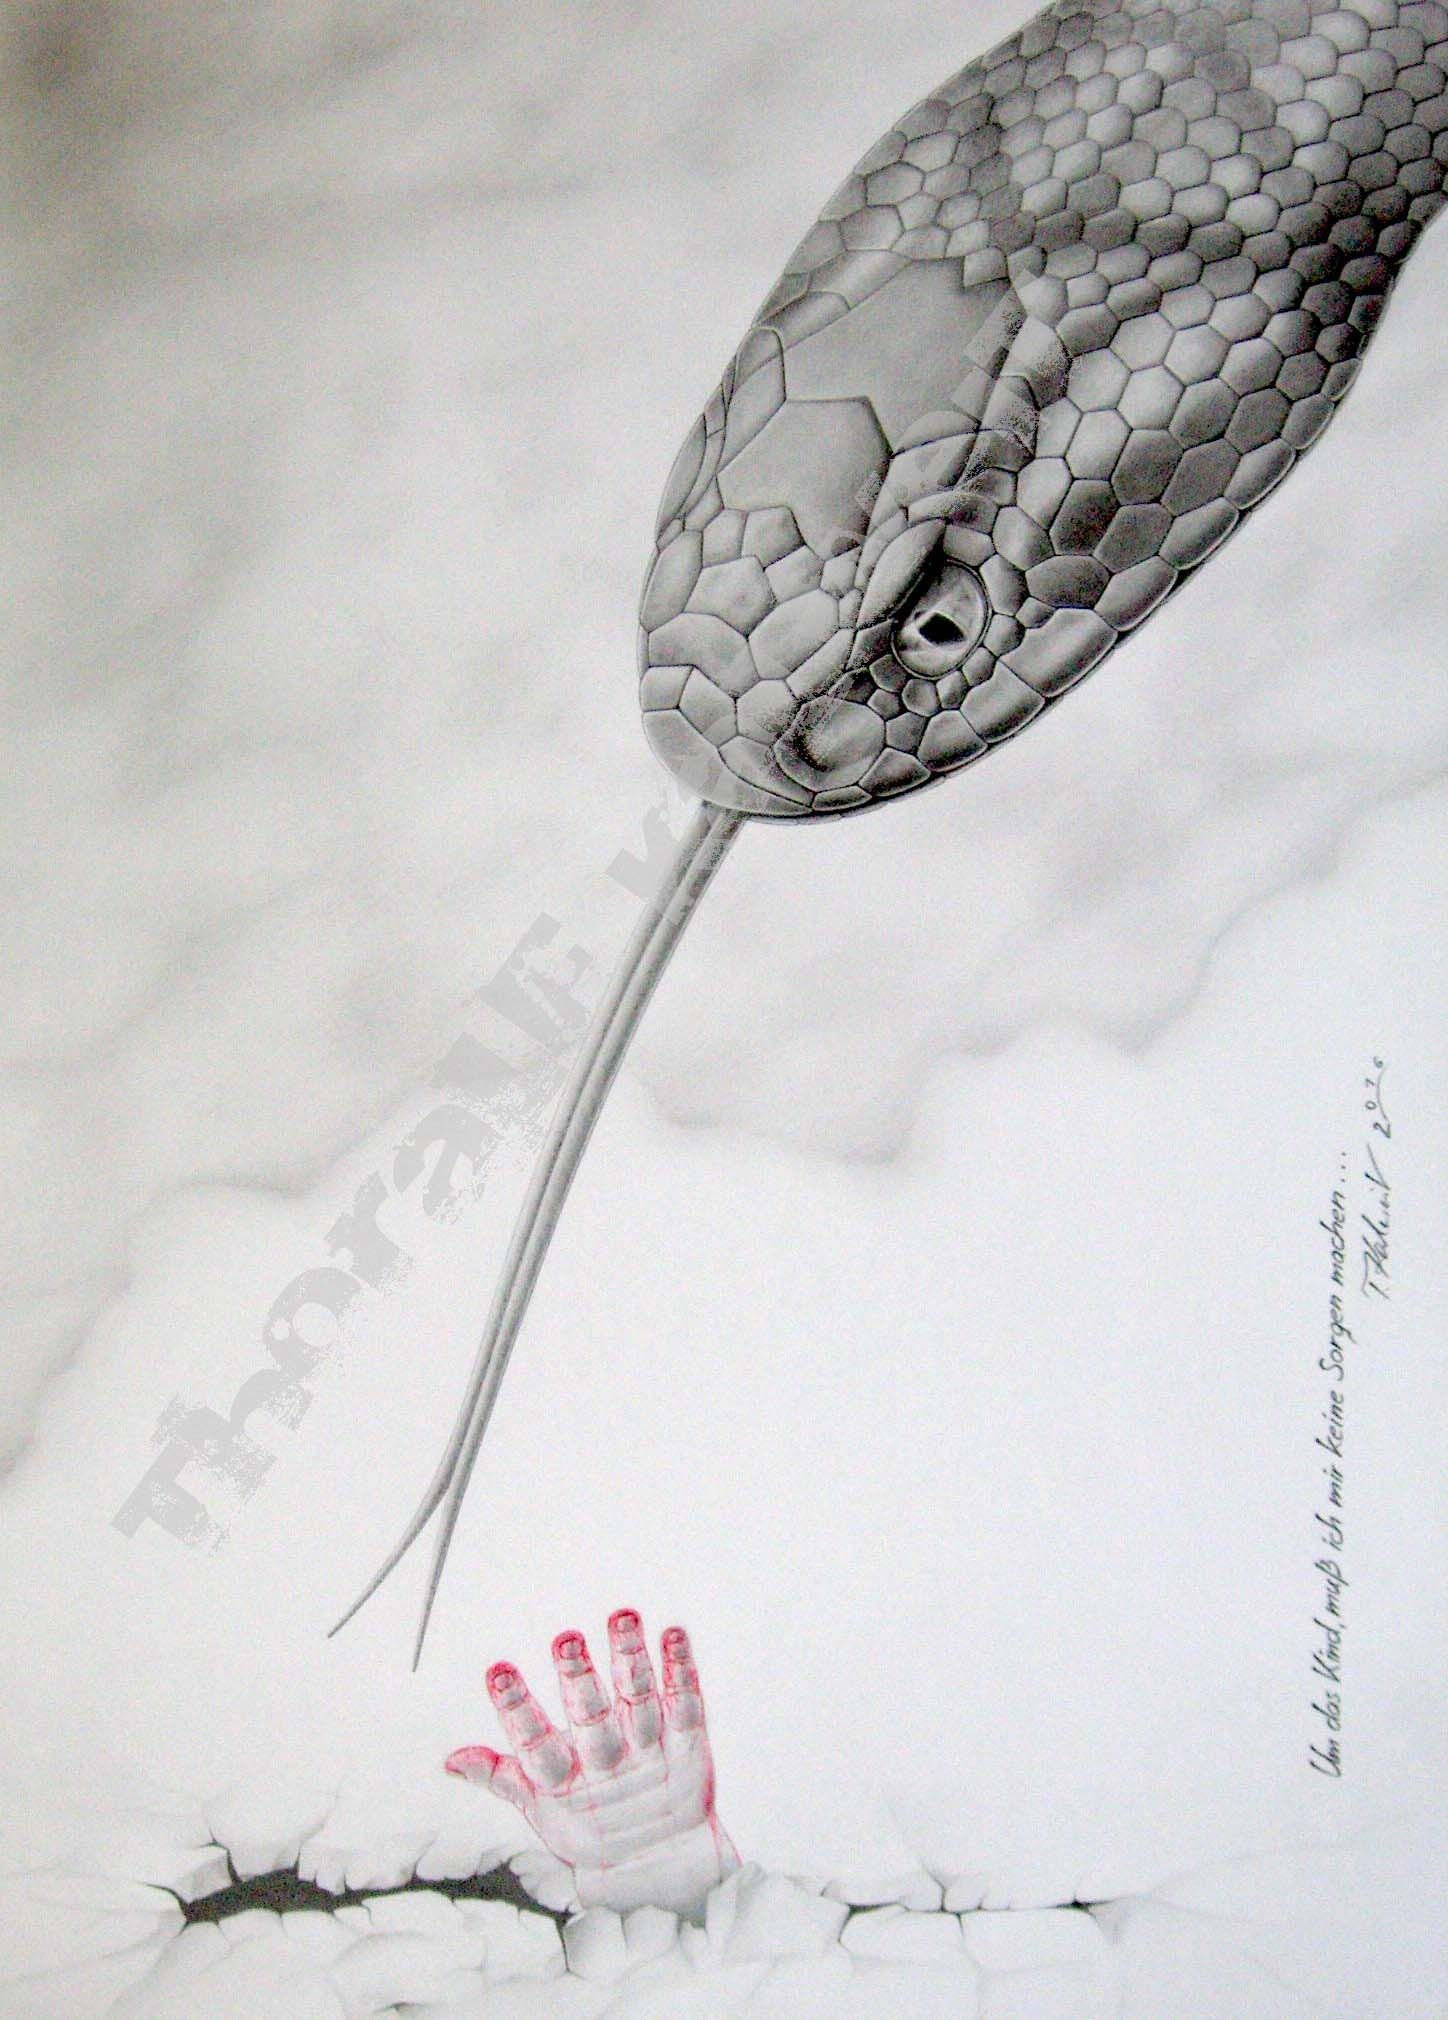 Schlange/Schlangen/Schlangenkopf/ Schlangen Zeichnung Bleistift ...